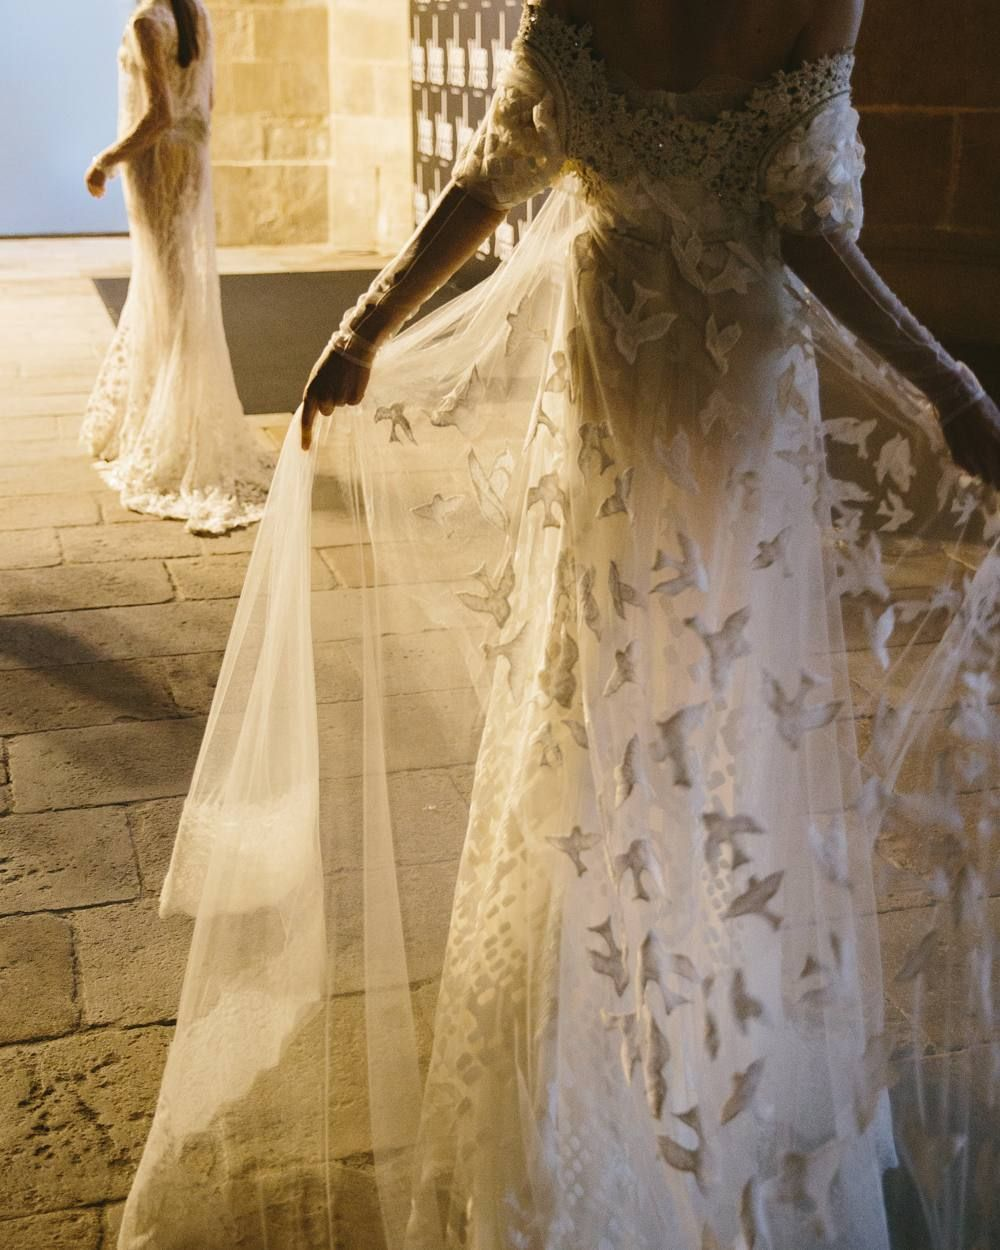 1950 wedding dress  YolanCris yolancris på Instagram ucIull spread my wings and I